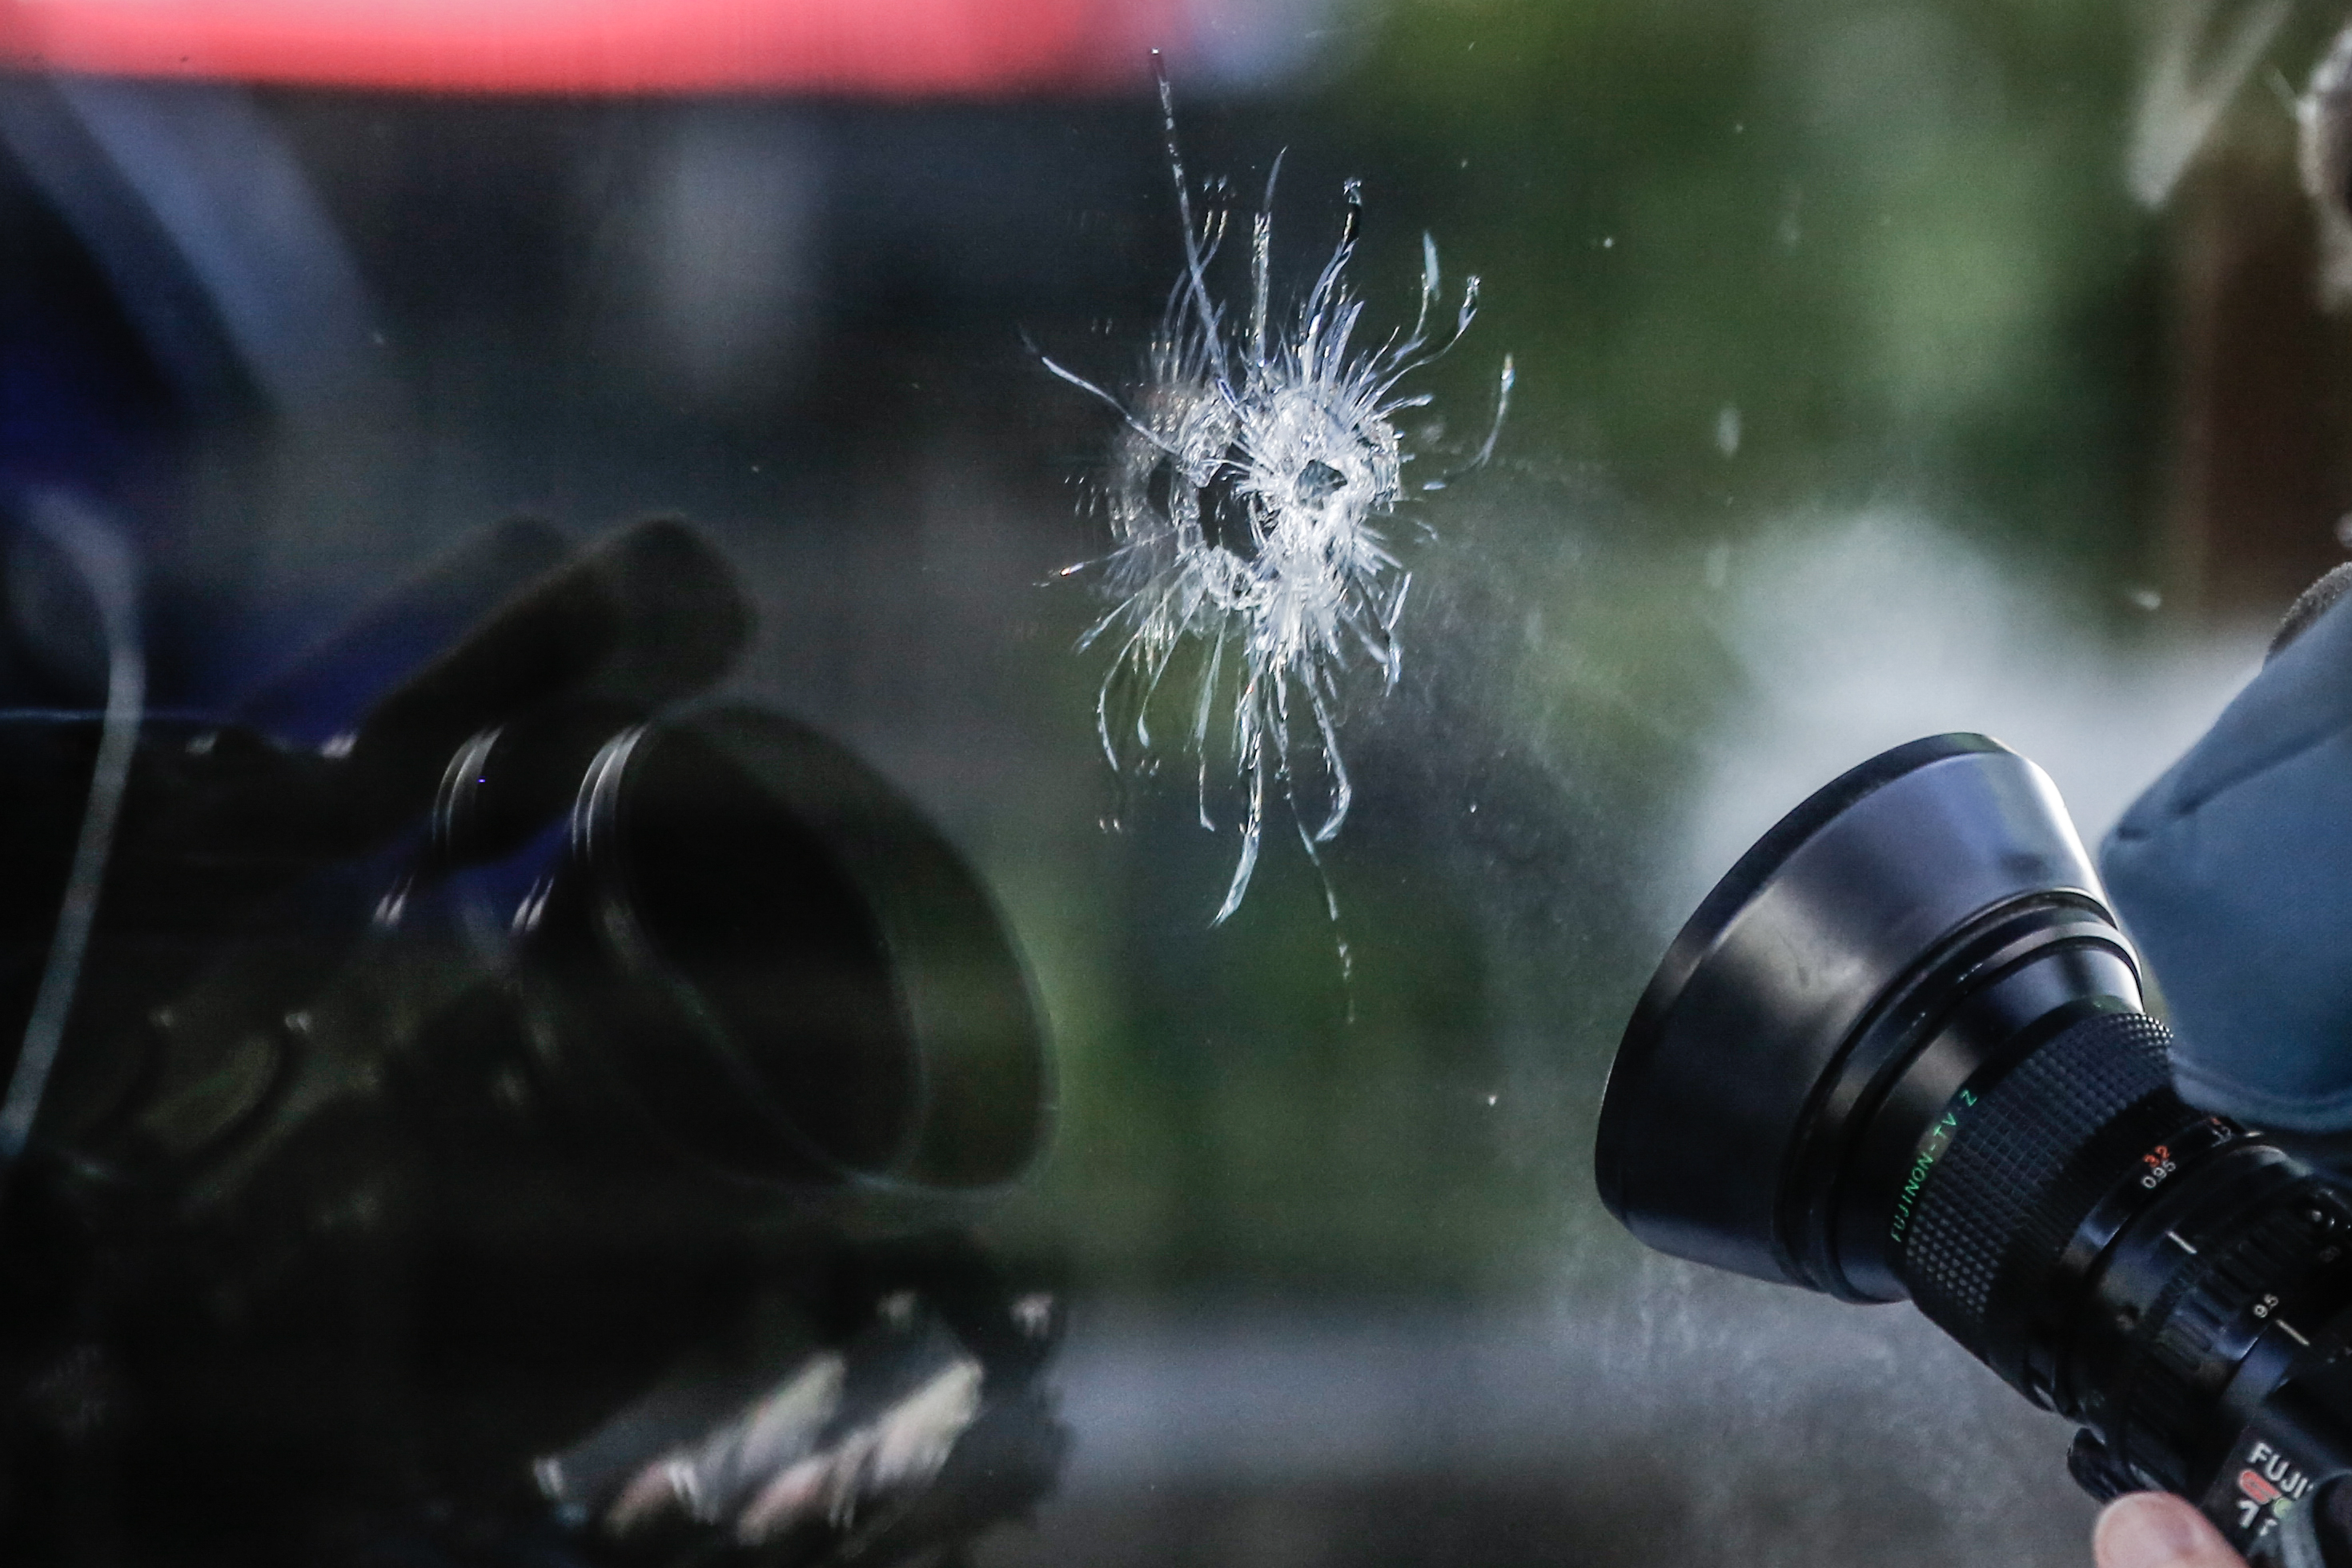 korydalos_1 Εικόνες από το σημείο όπου πυροβολήθηκε η 29χρονη από αδέσποτη σφαίρα στον Κορυδαλλό